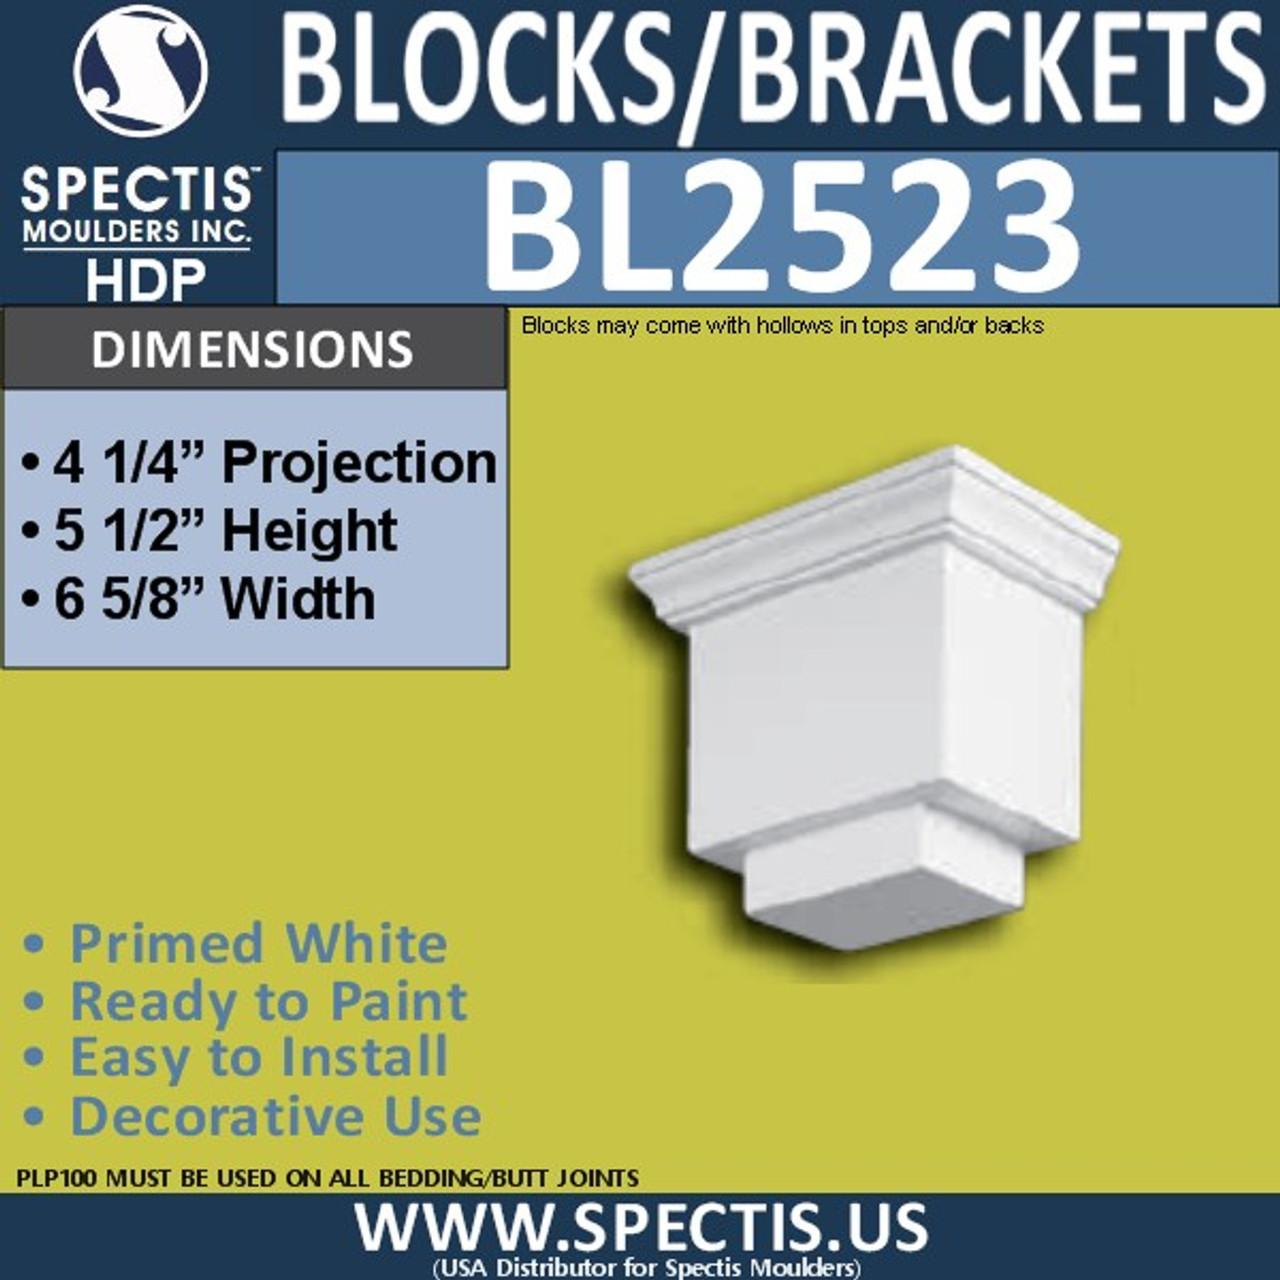 "BL2523 Eave Block or Bracket 6.5""W x 5.5""H x 4.25"" P"